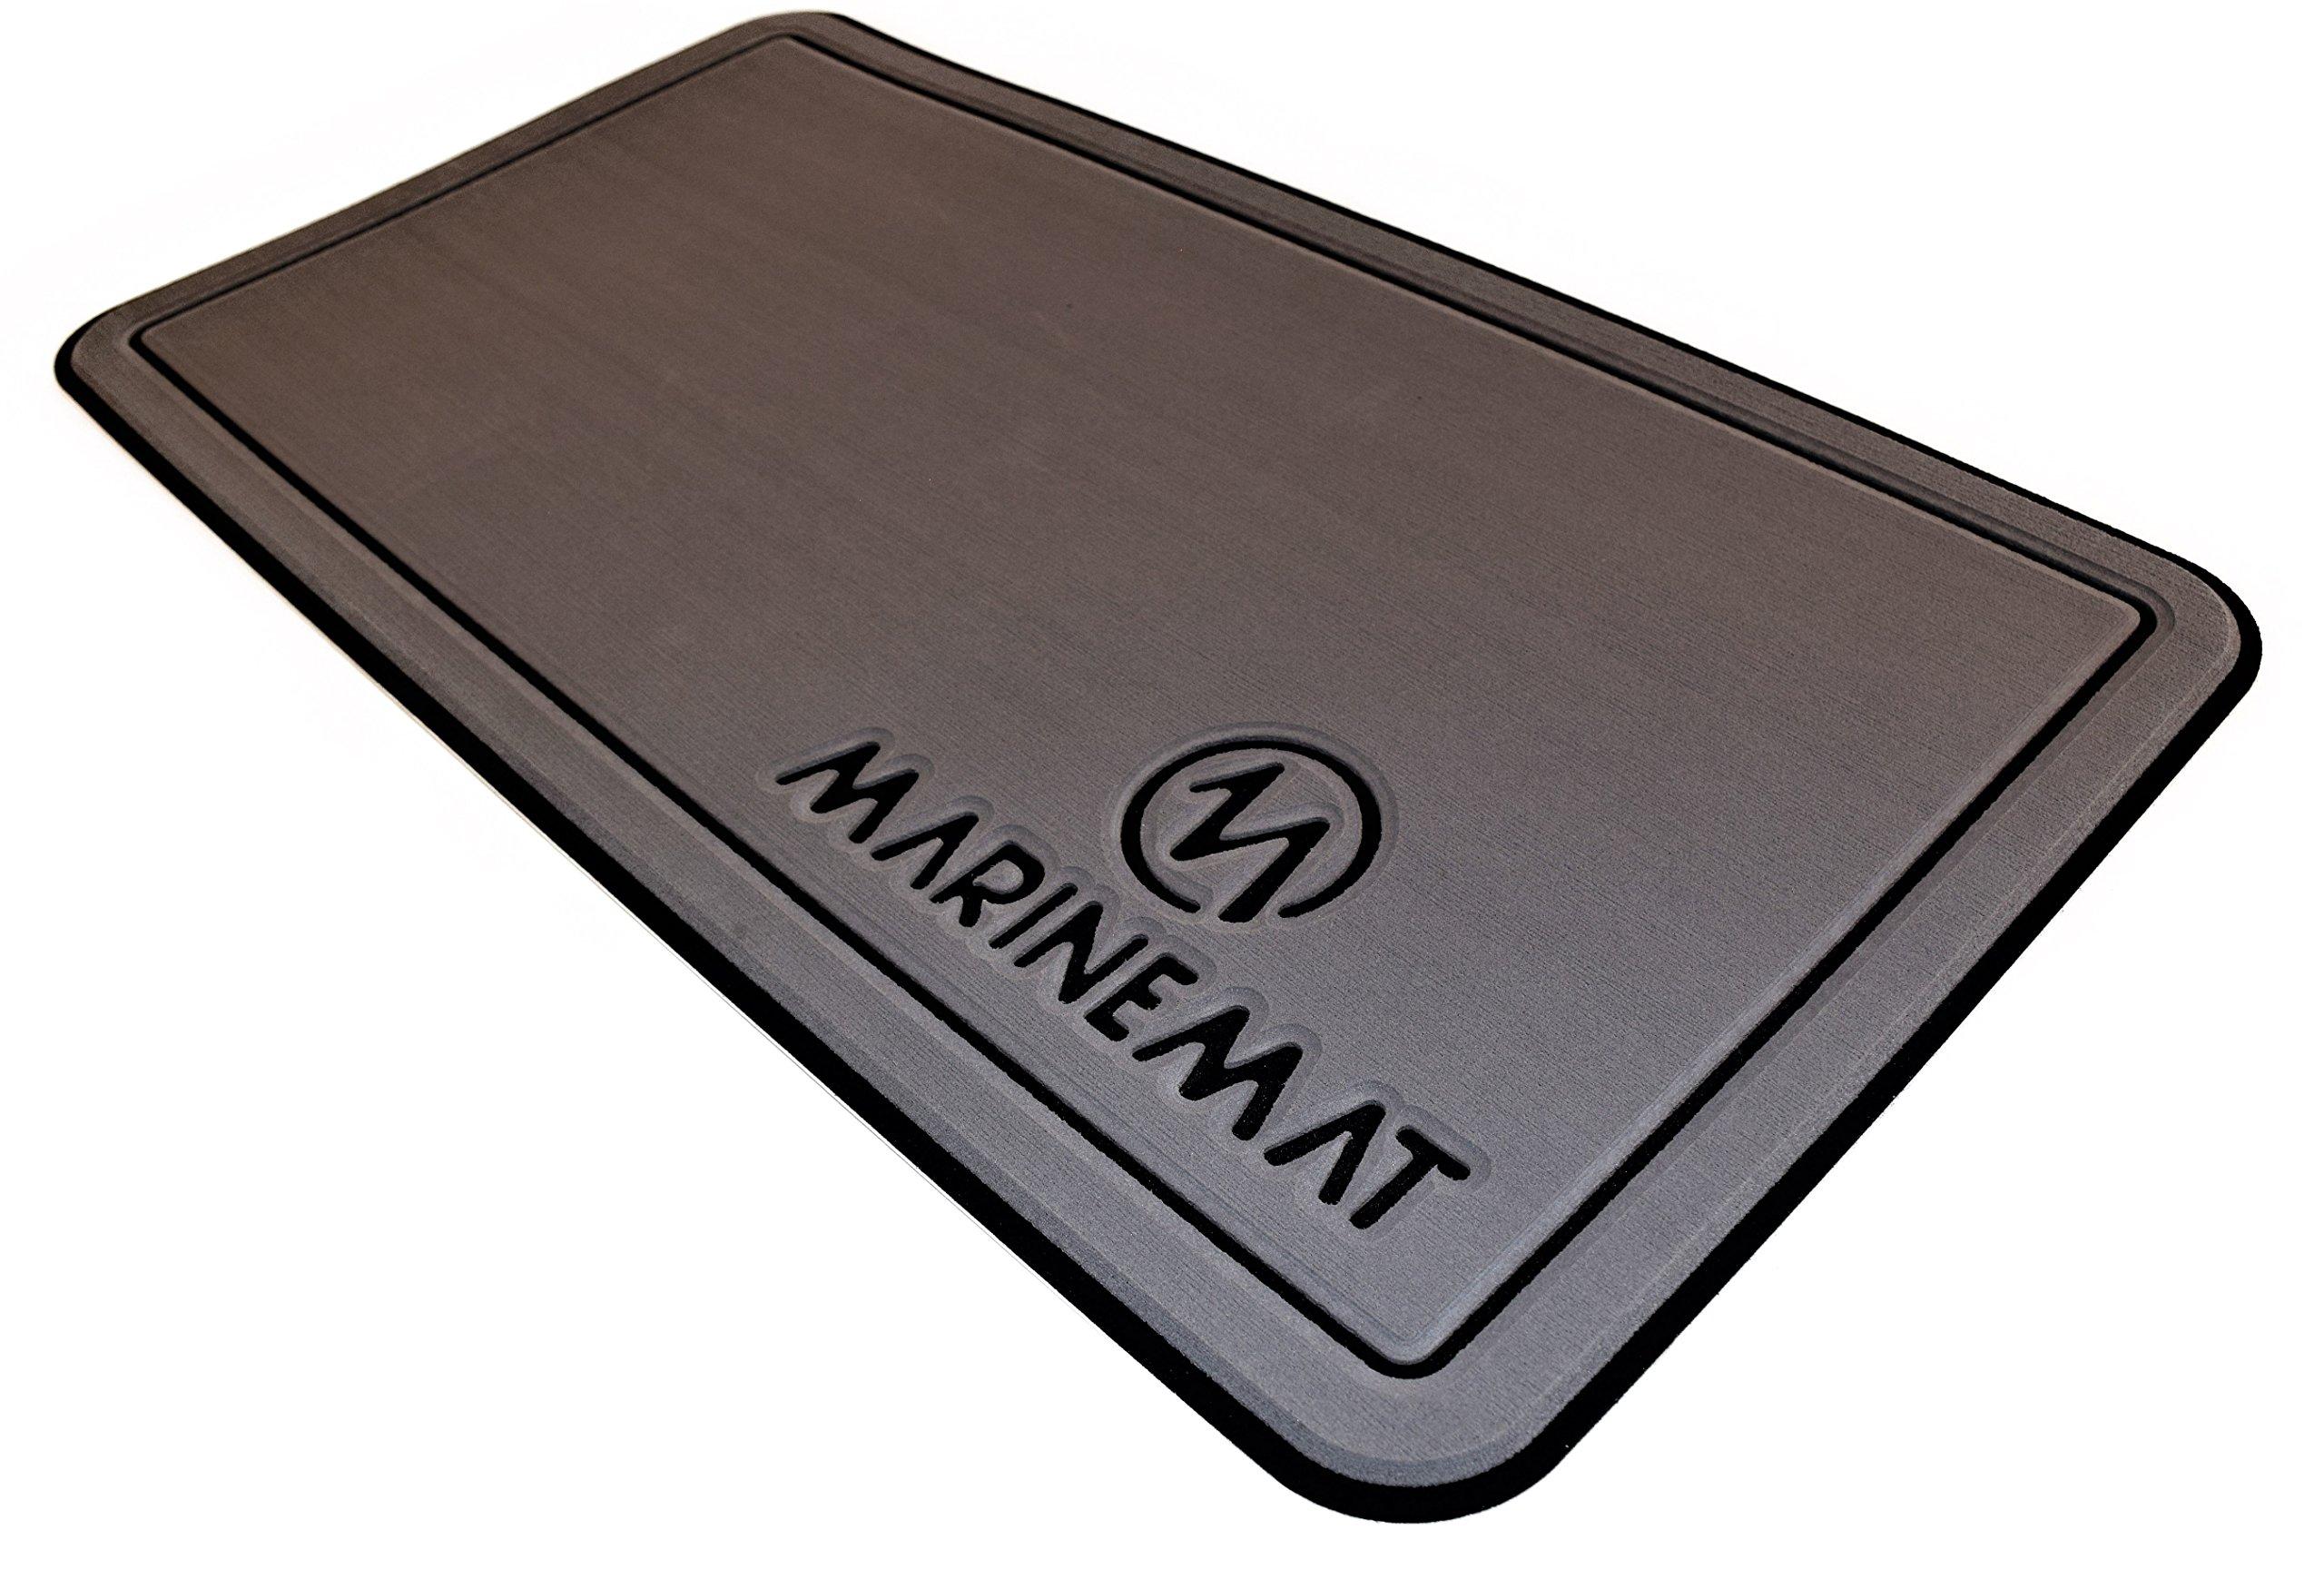 Marine Mat YETI Tundra Cooler Pad (Slate Gray Over Black, Fits Tundra 20) by Marine Mat